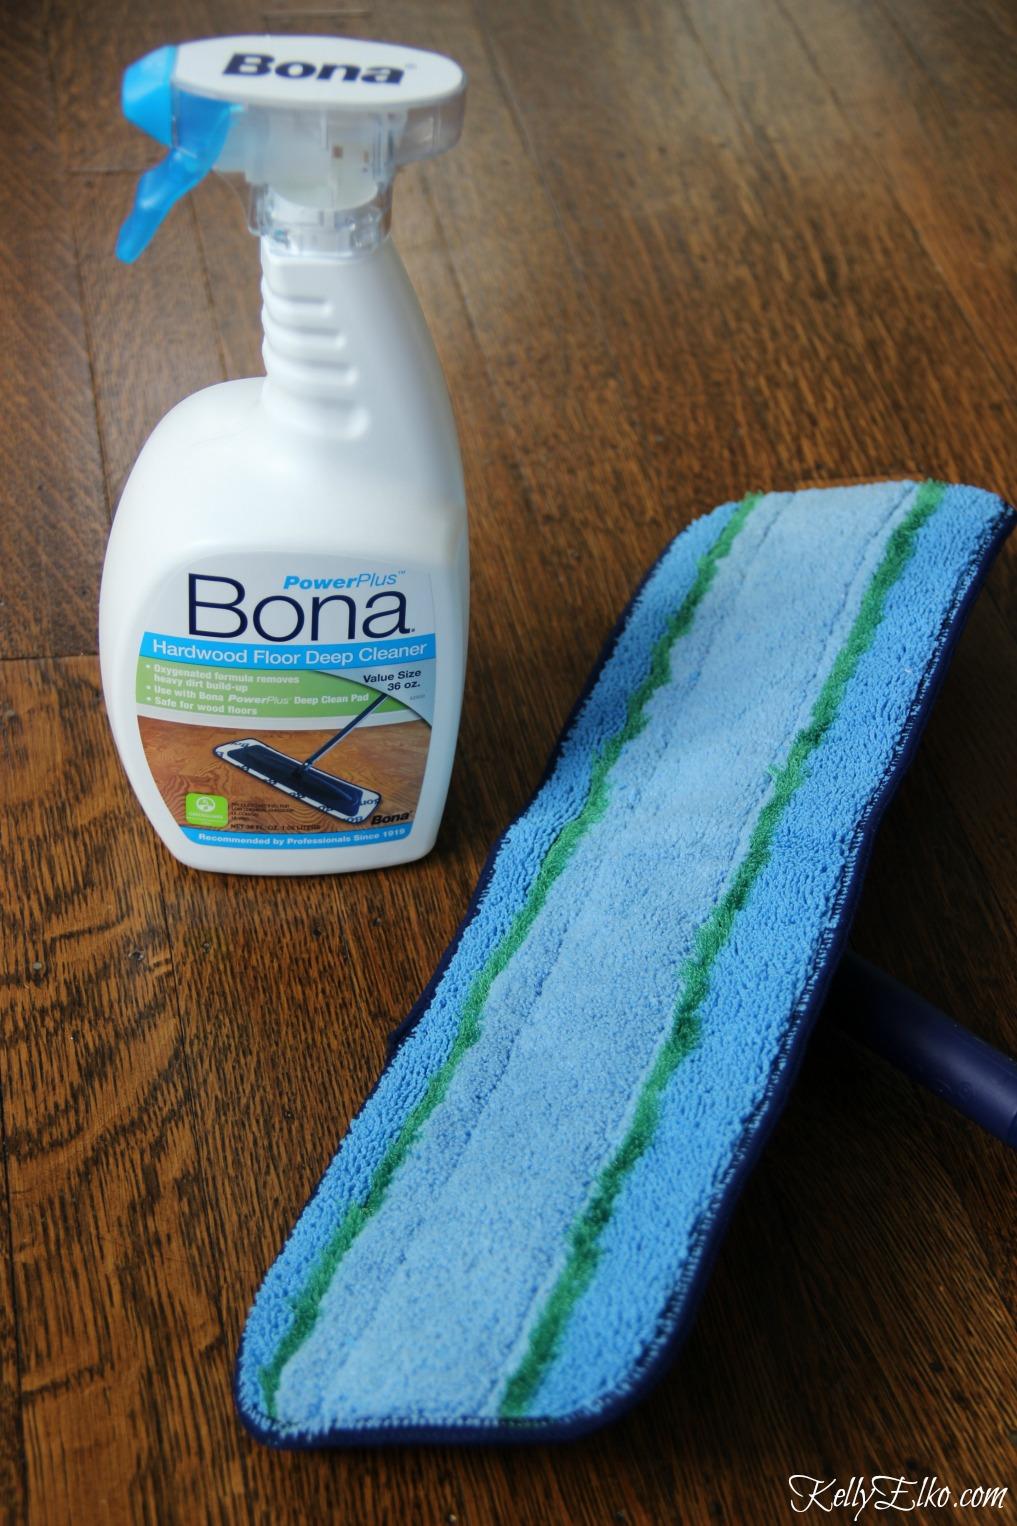 Bona hardwood floor cleaner kellyelko.com